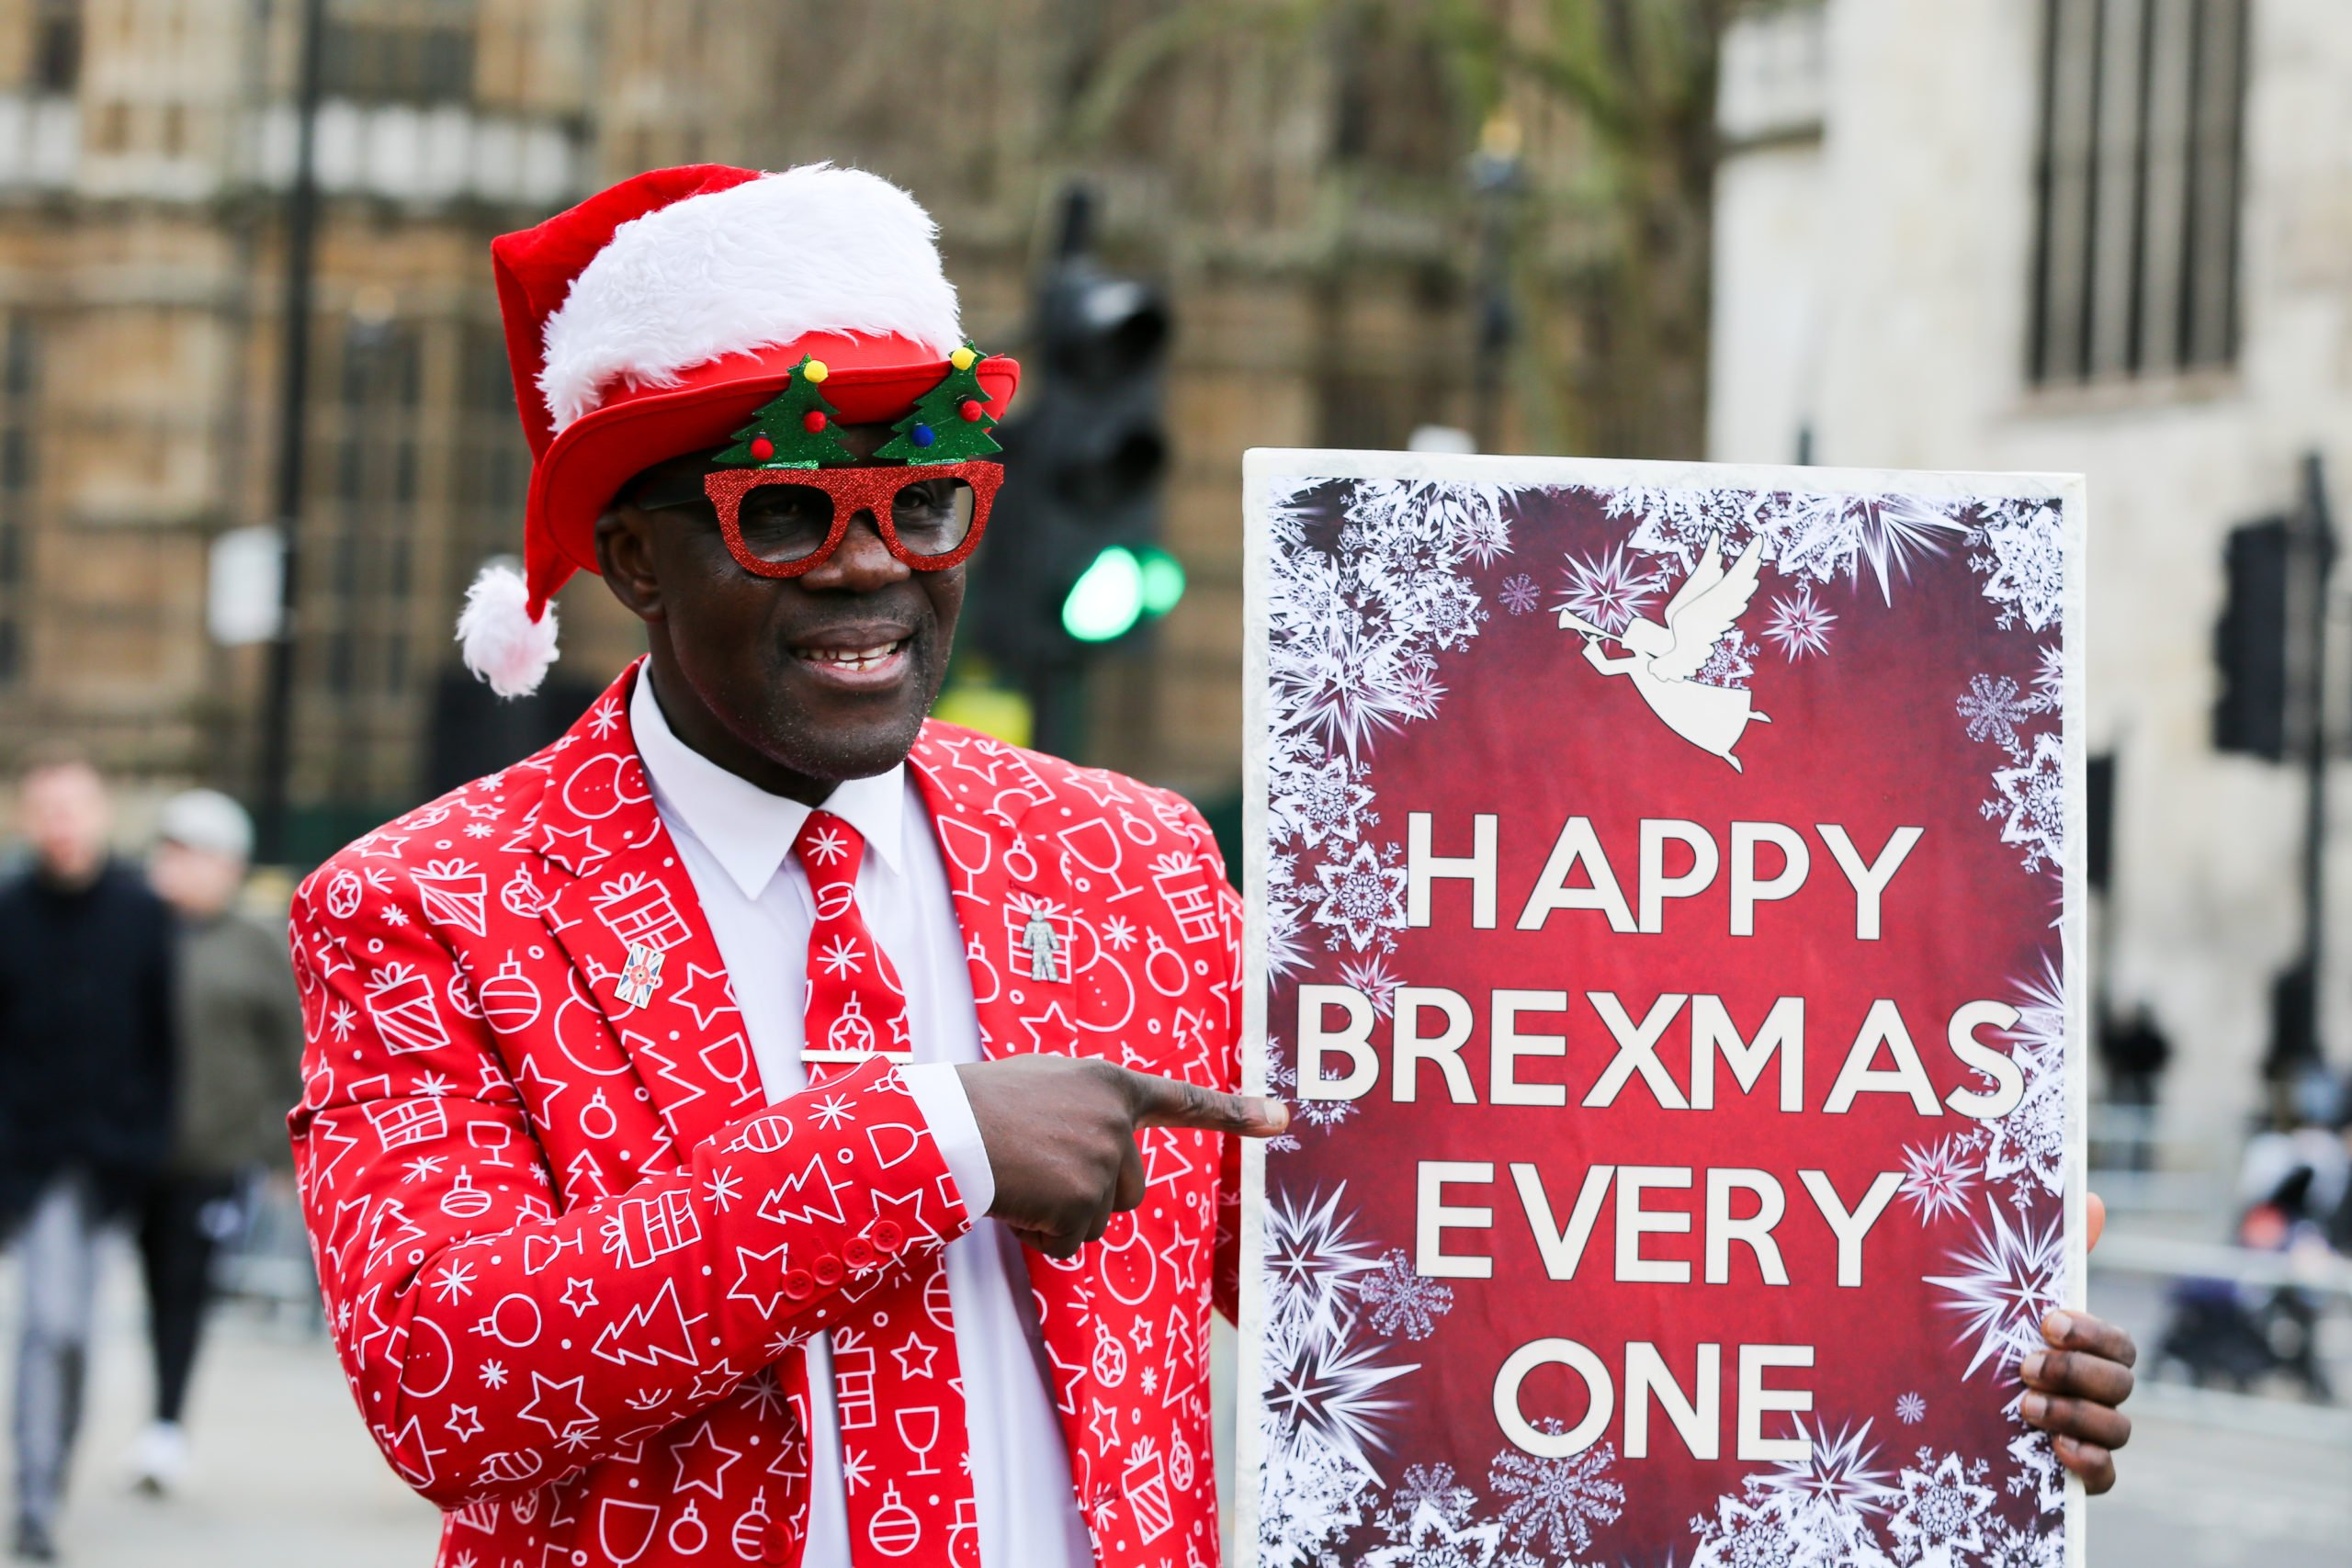 Gran Bretagna - voto - Brexit - Ue